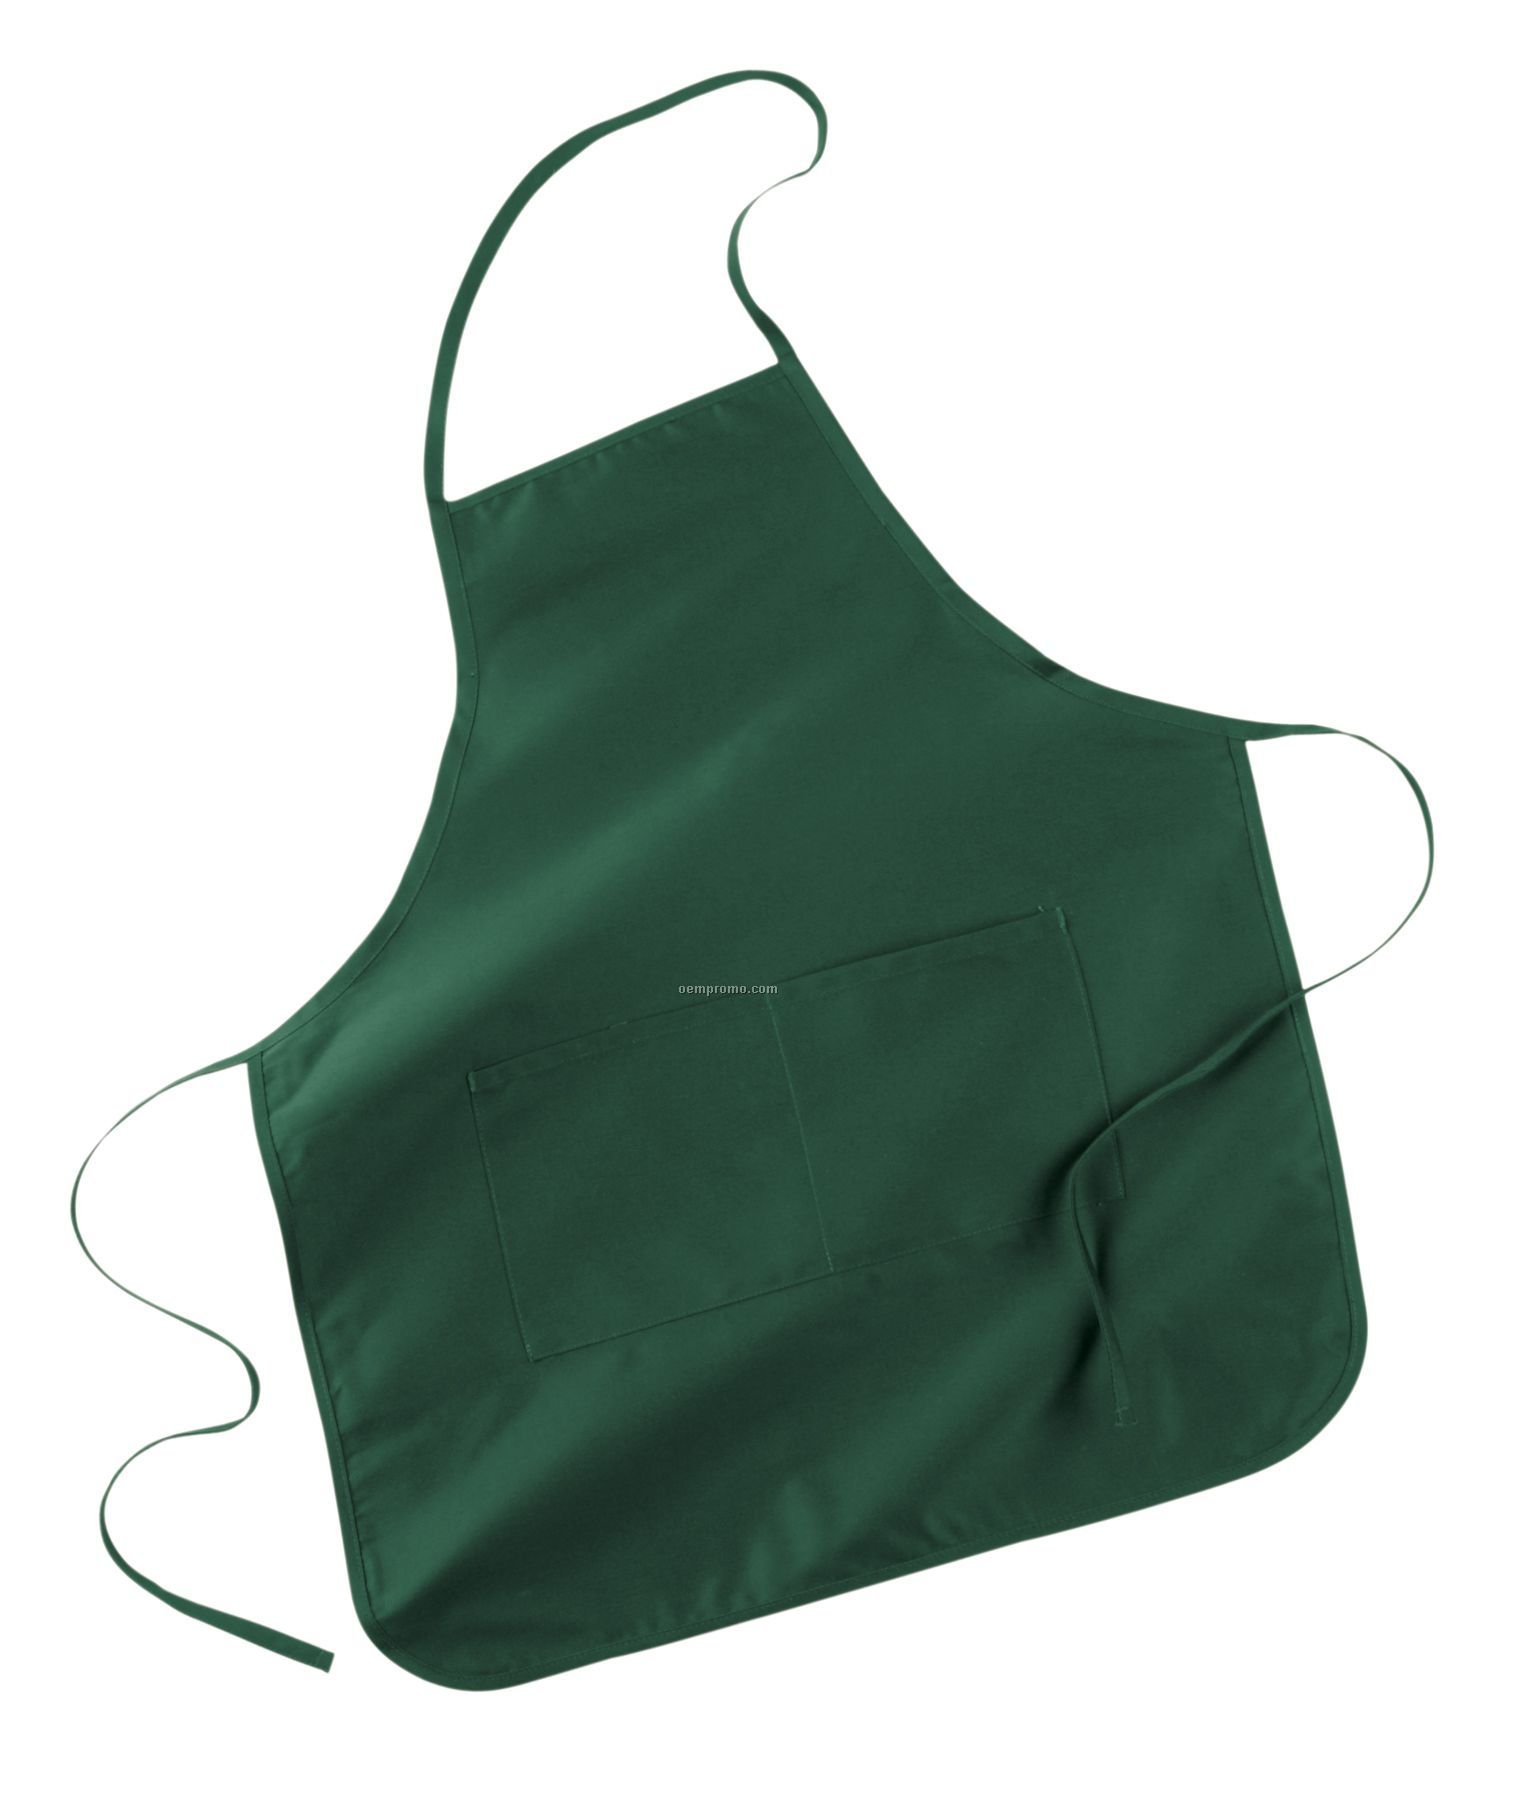 Kc Caps Large Pocketed Apron - Natural